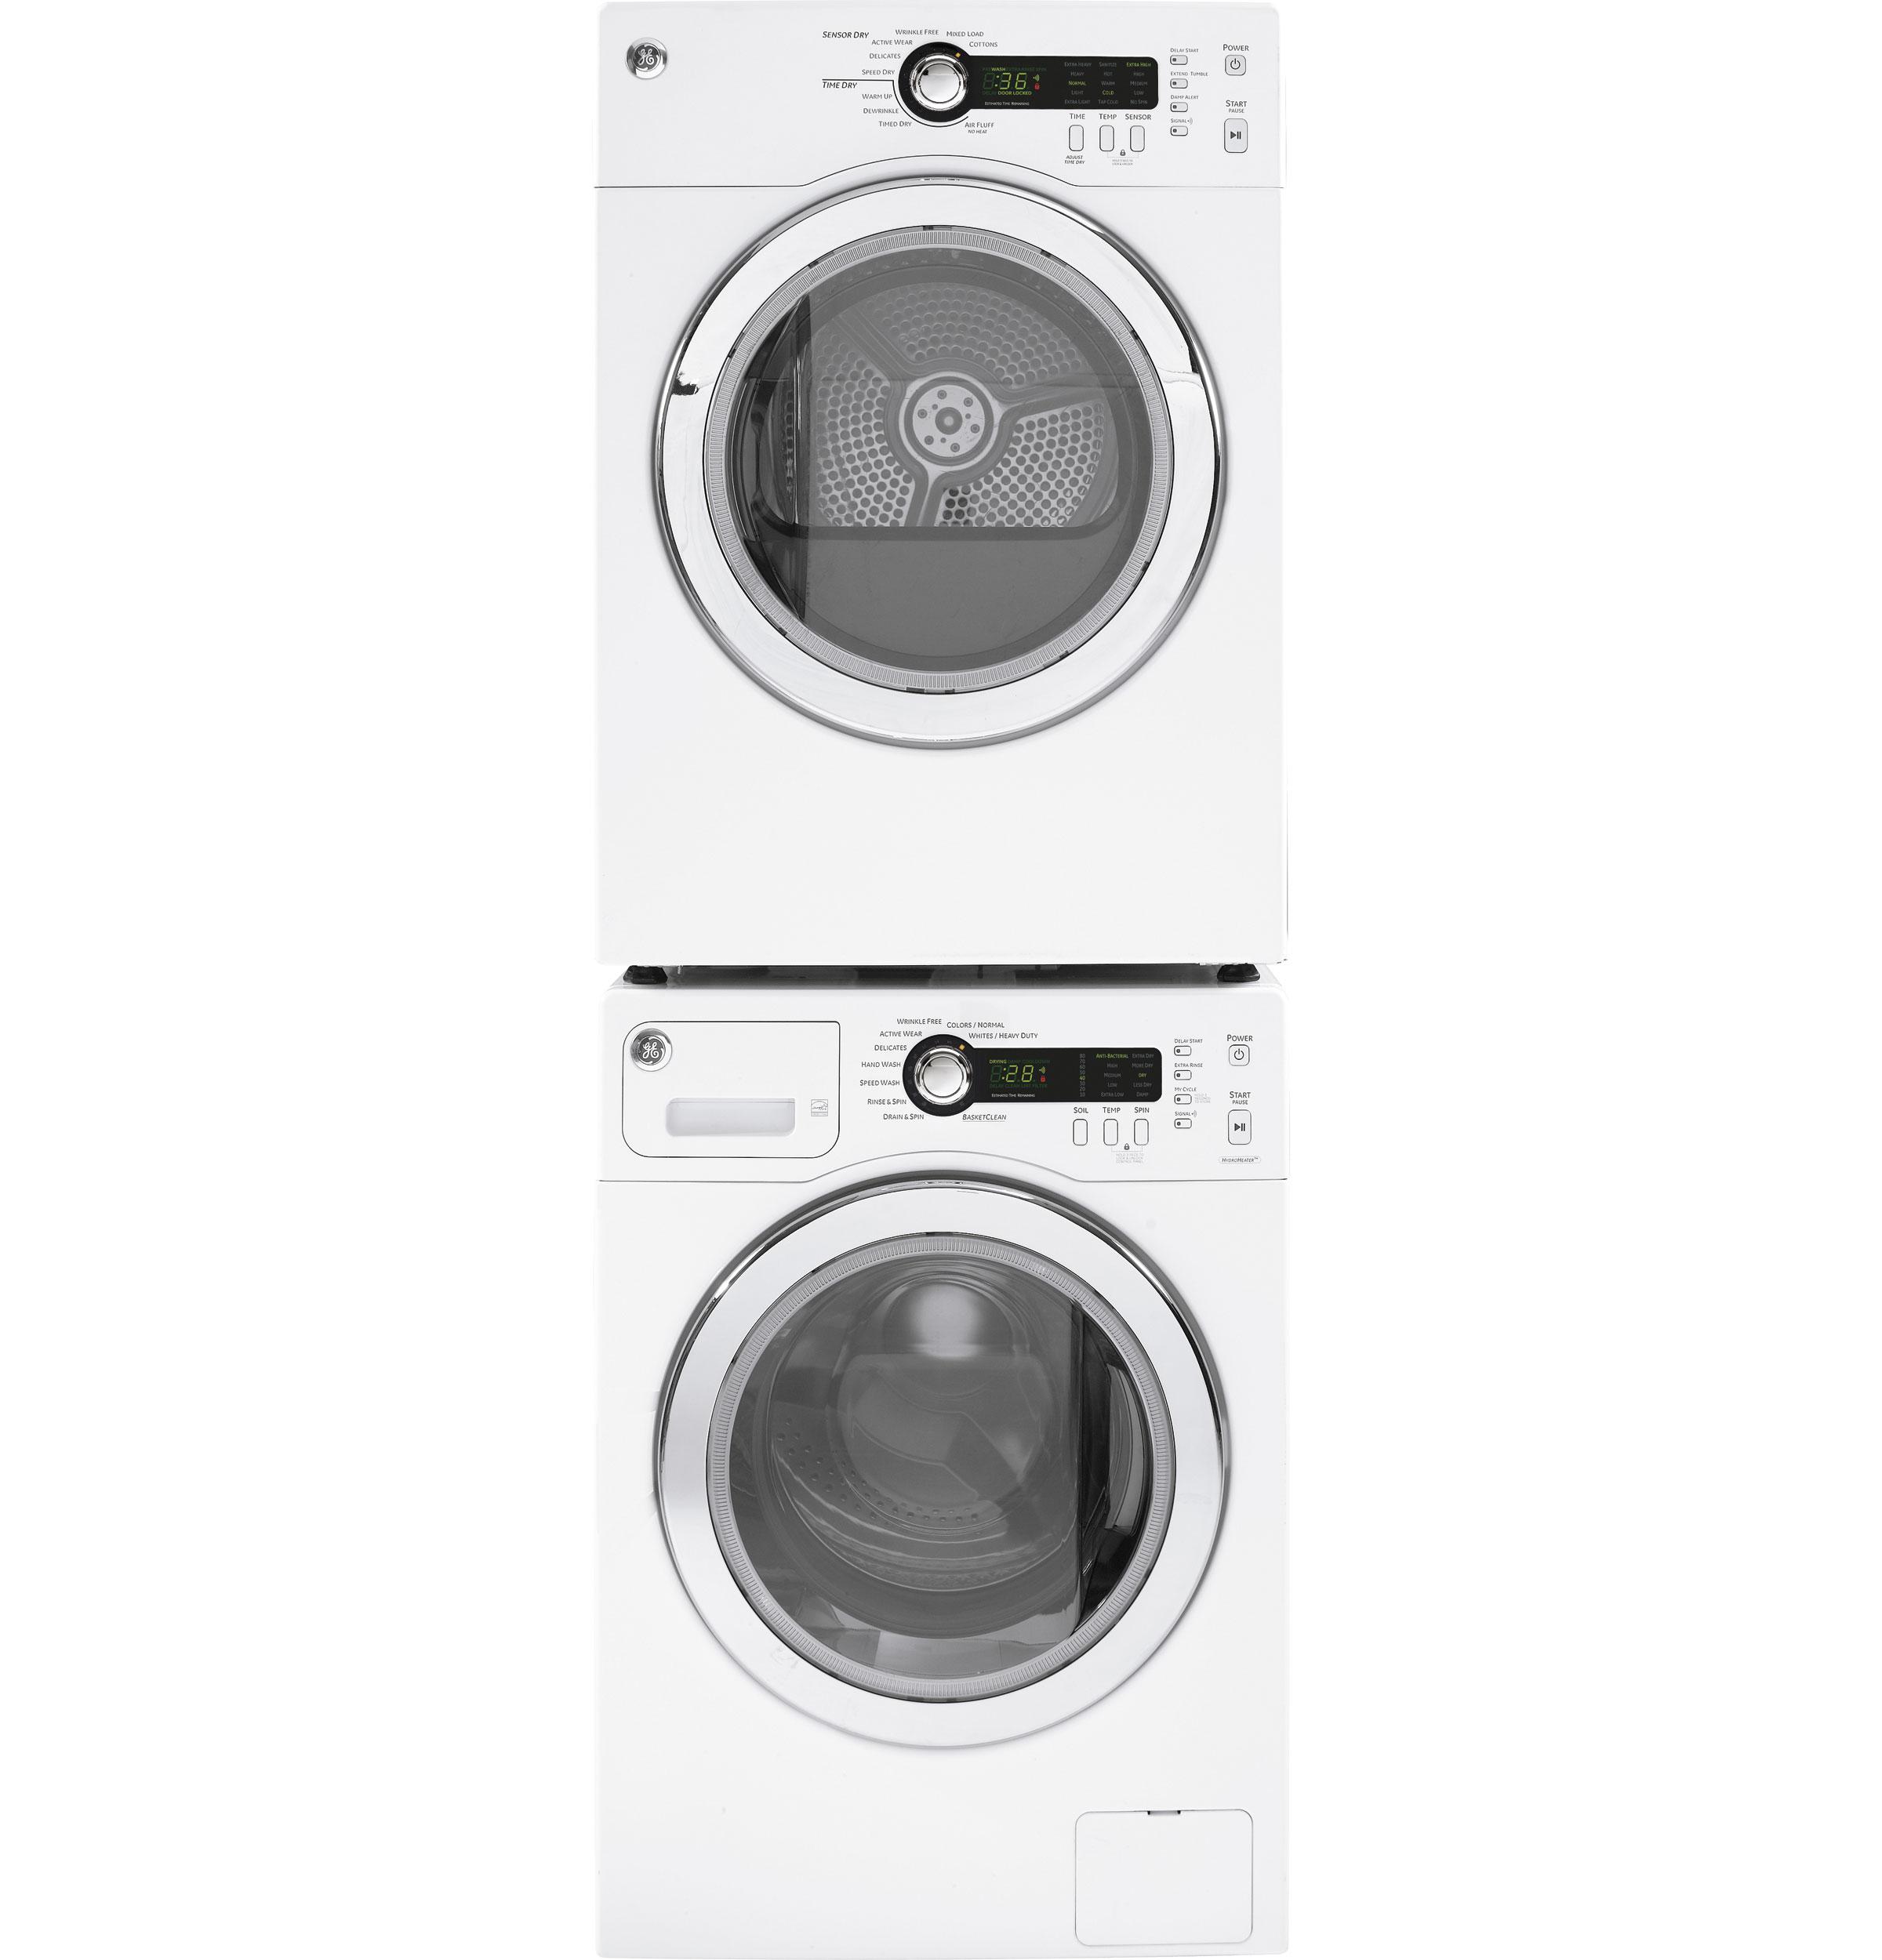 Ge Dcvh480ekww Electric 40 Cuft Capacity Dryer Joshua Bate Washing Machine Wiring Diagram 004 003 002